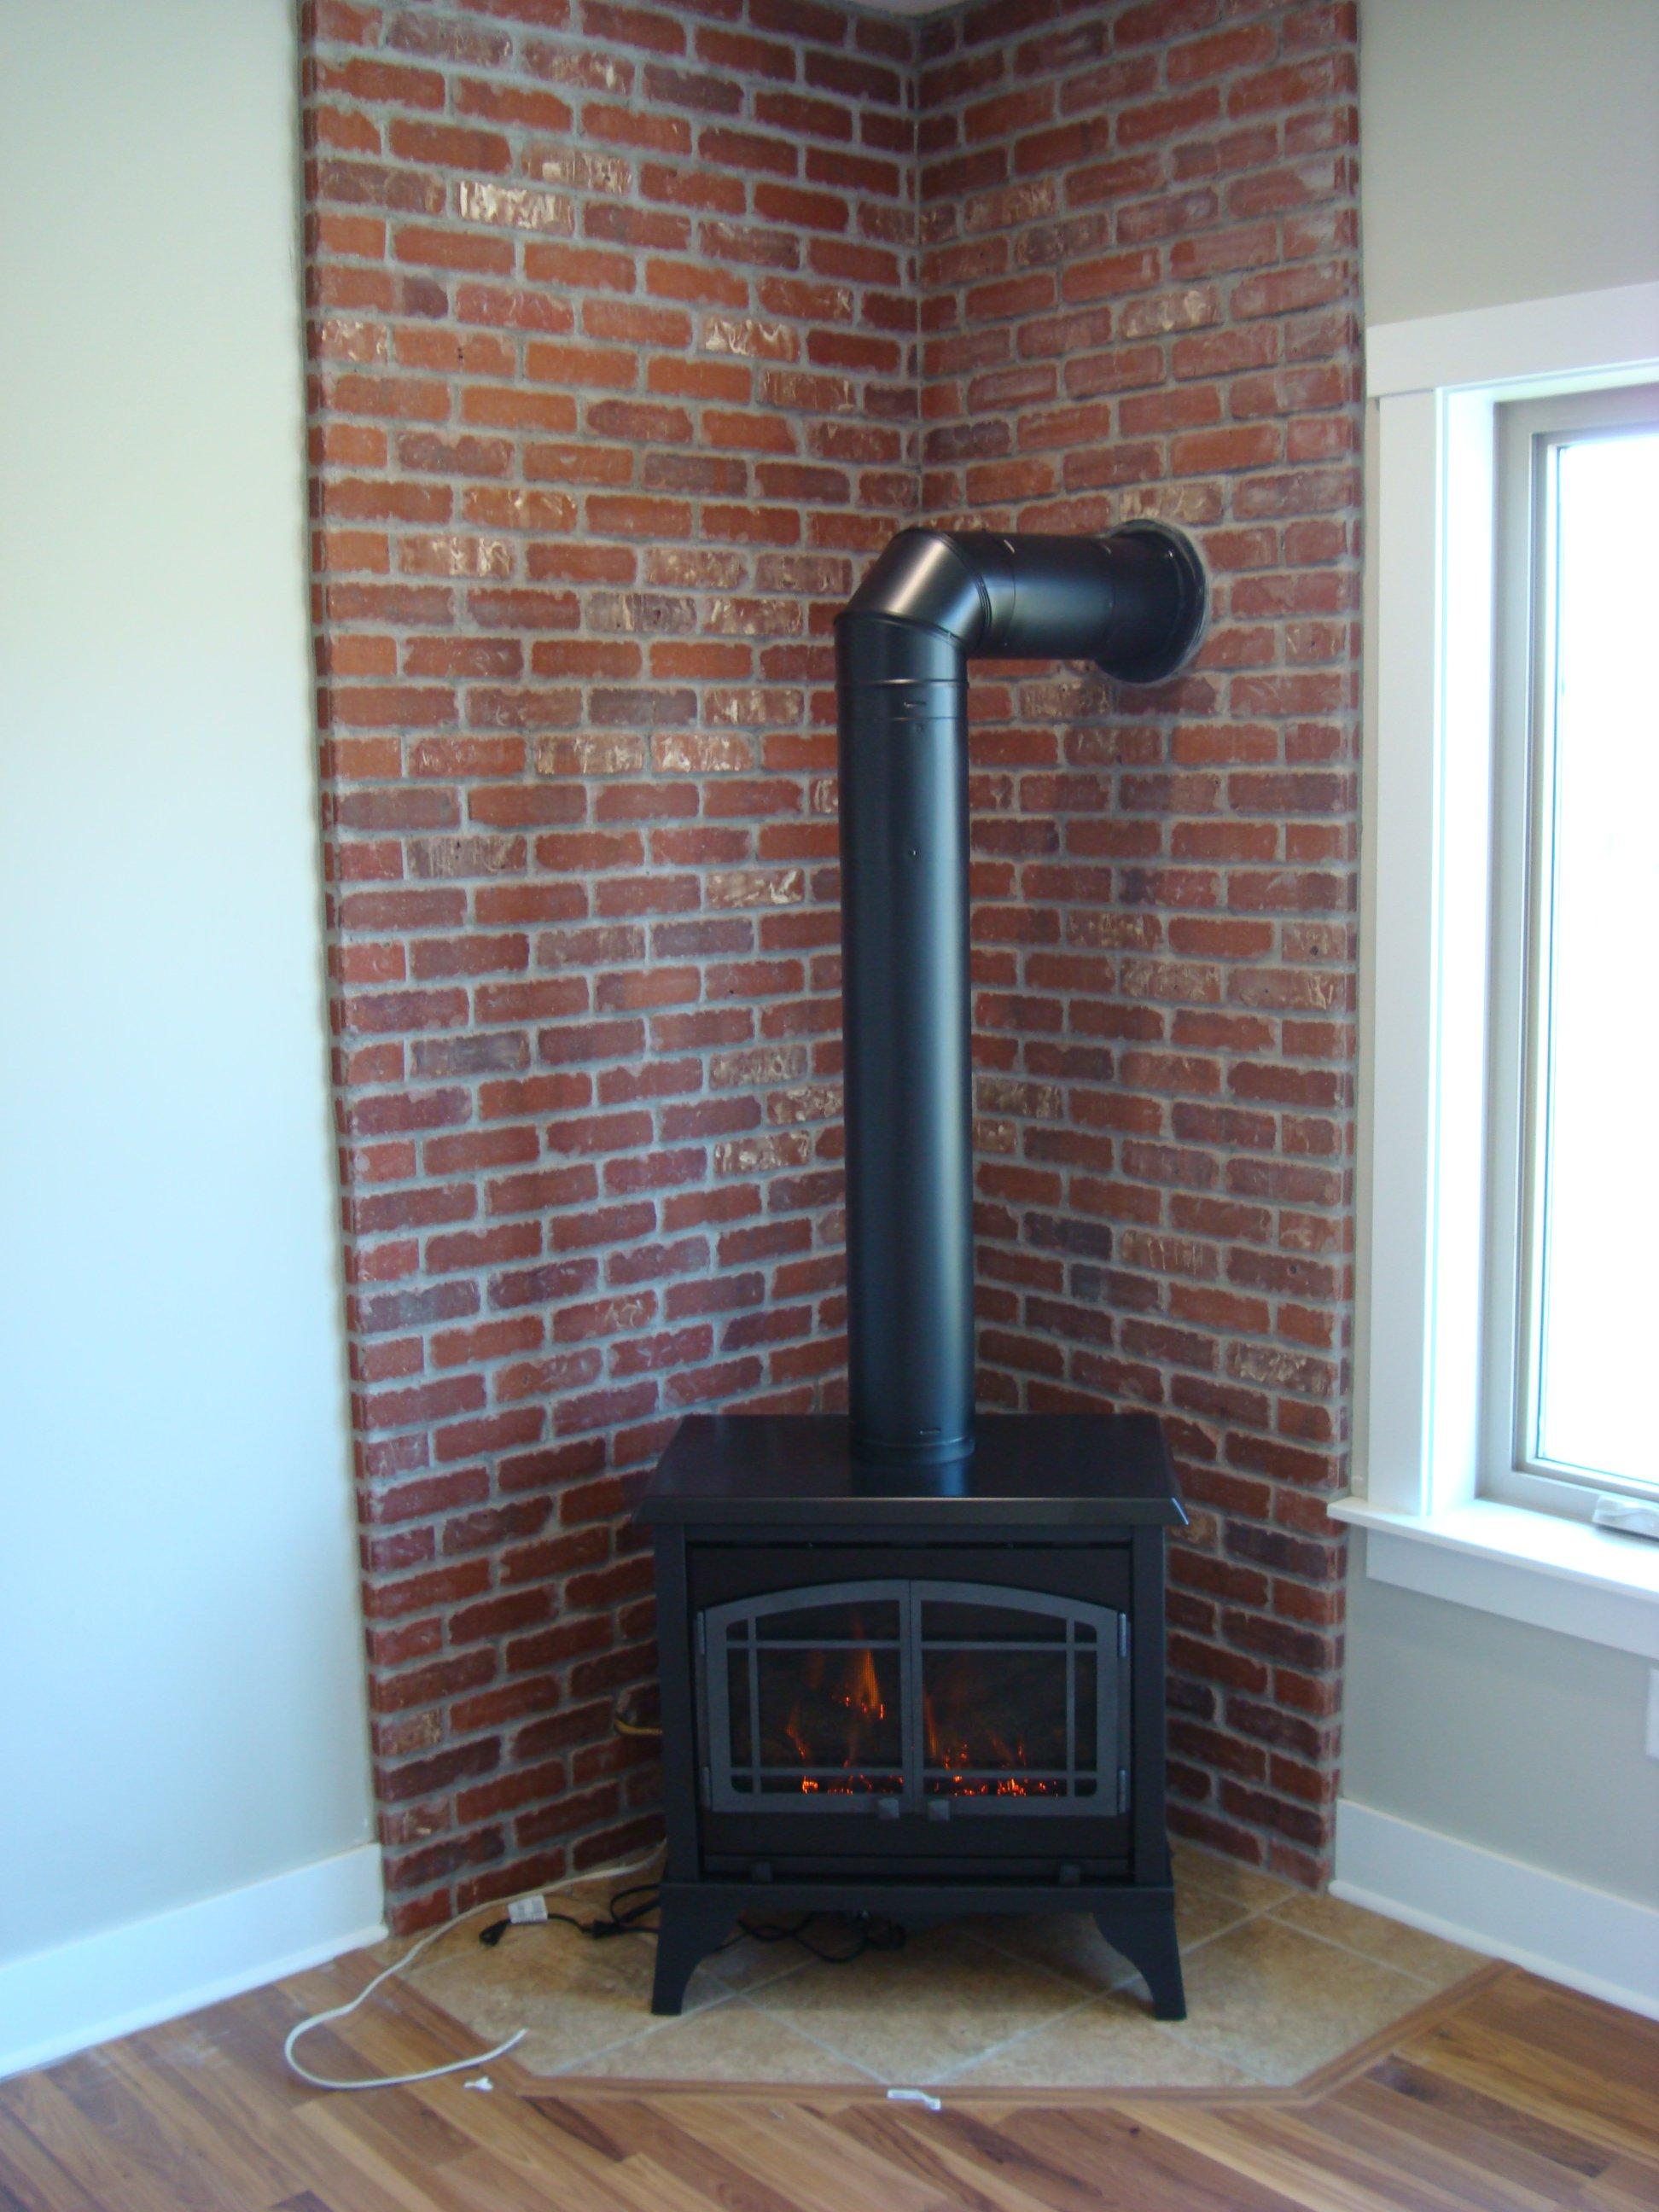 Kozy Heat, lake field gas stove, traditional gas stove.